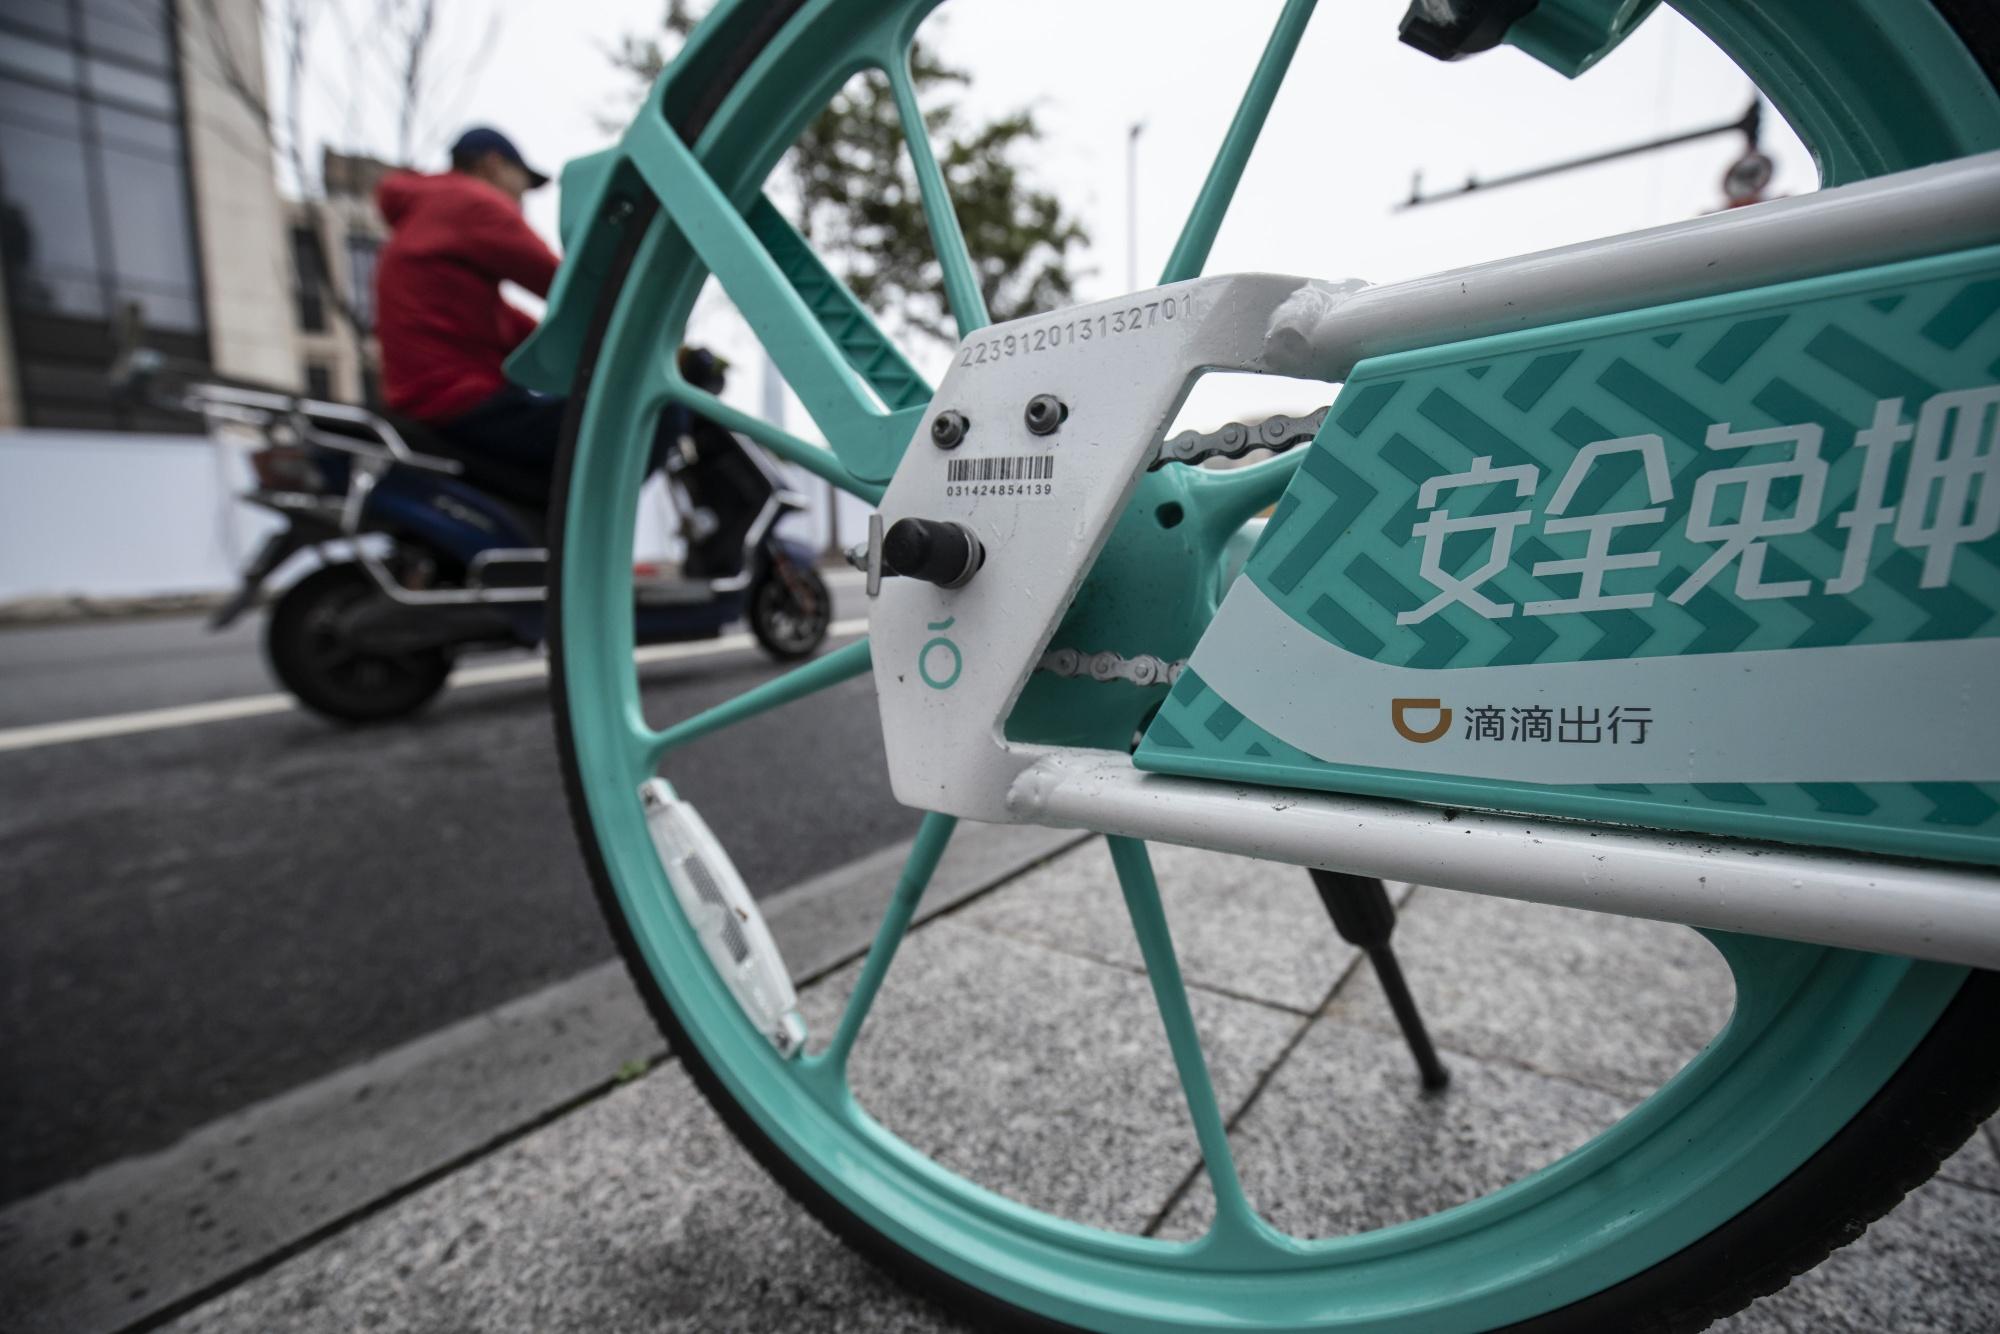 The logo of Didi Chuxing Inc. on a shared-bike standing on the sidewalk in Shanghai.